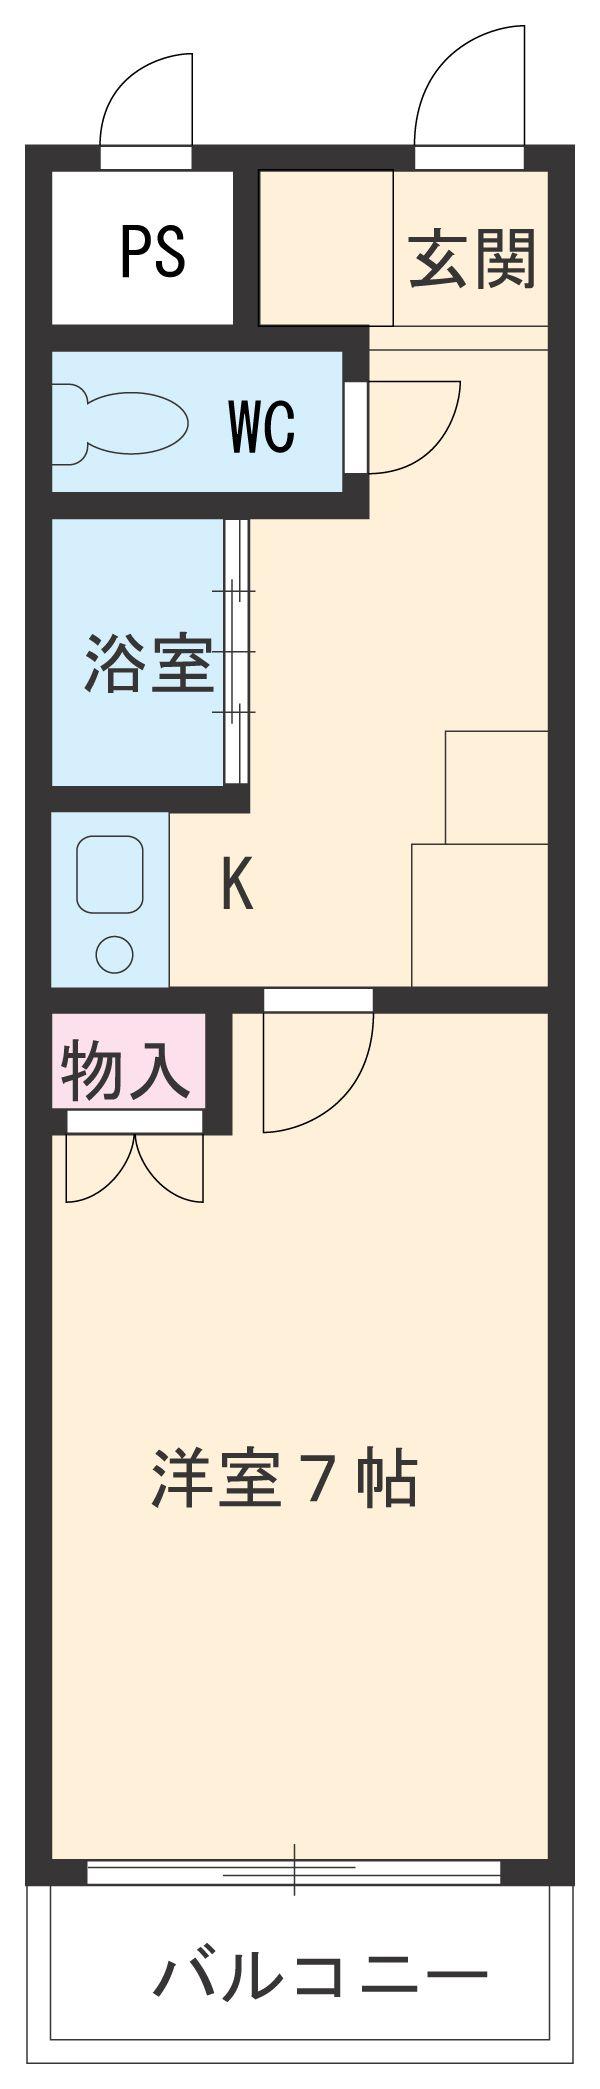 C'pac三河豊田 102号室の間取り